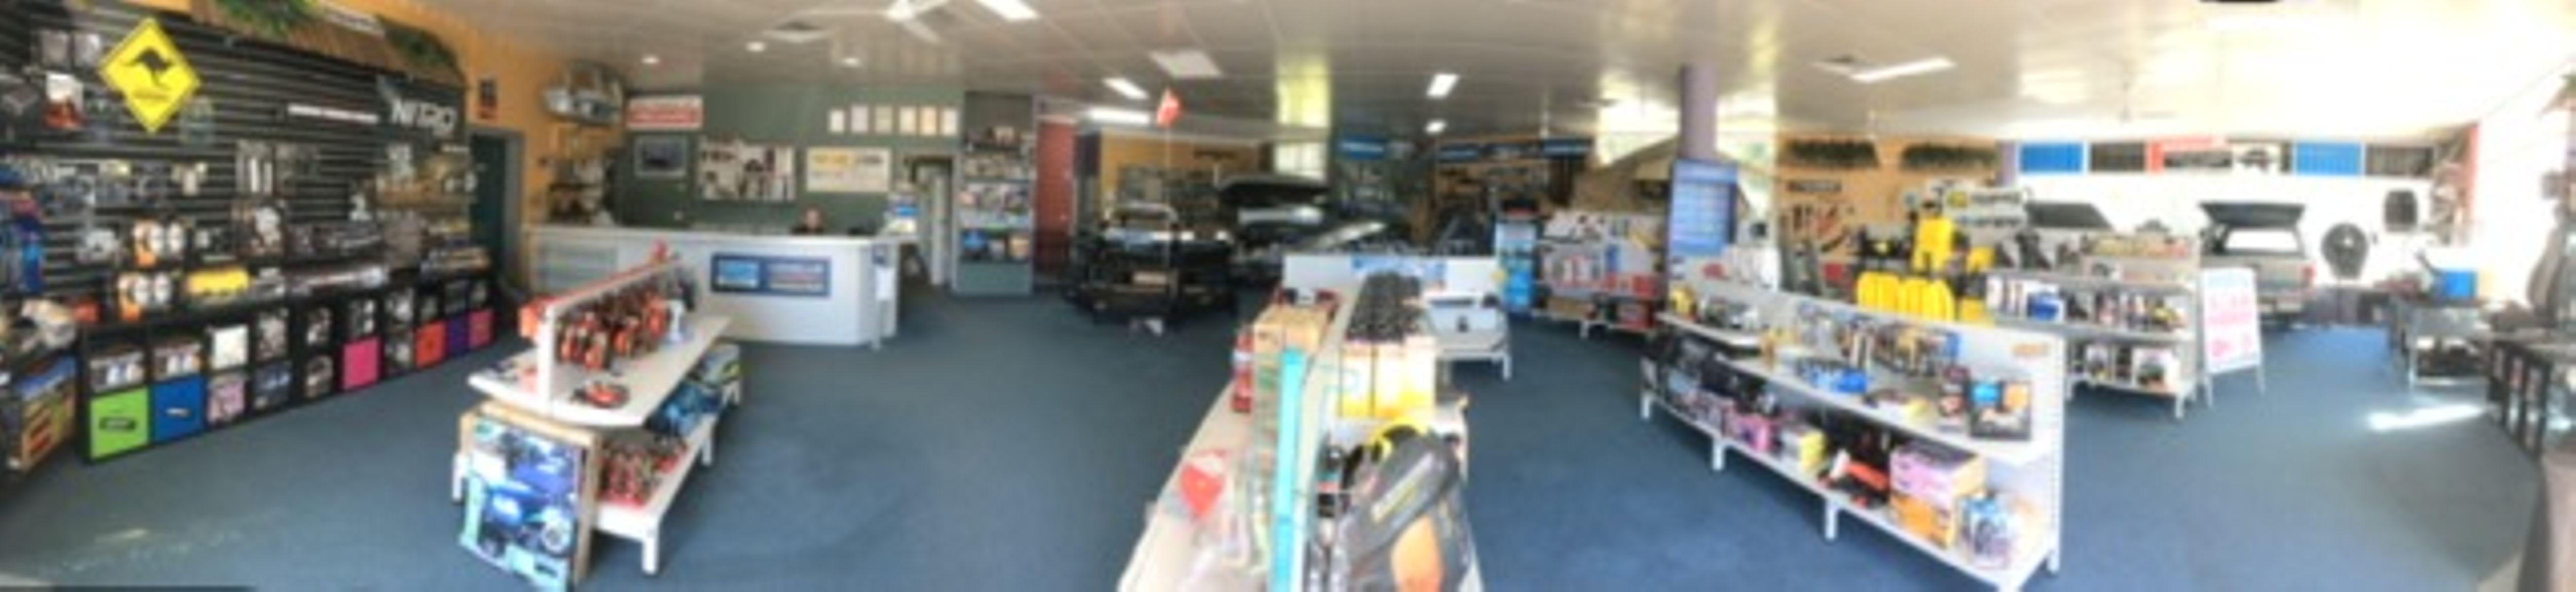 . Cnr Southern Cross Drive & Convair Avenue, Ballina, NSW 2478